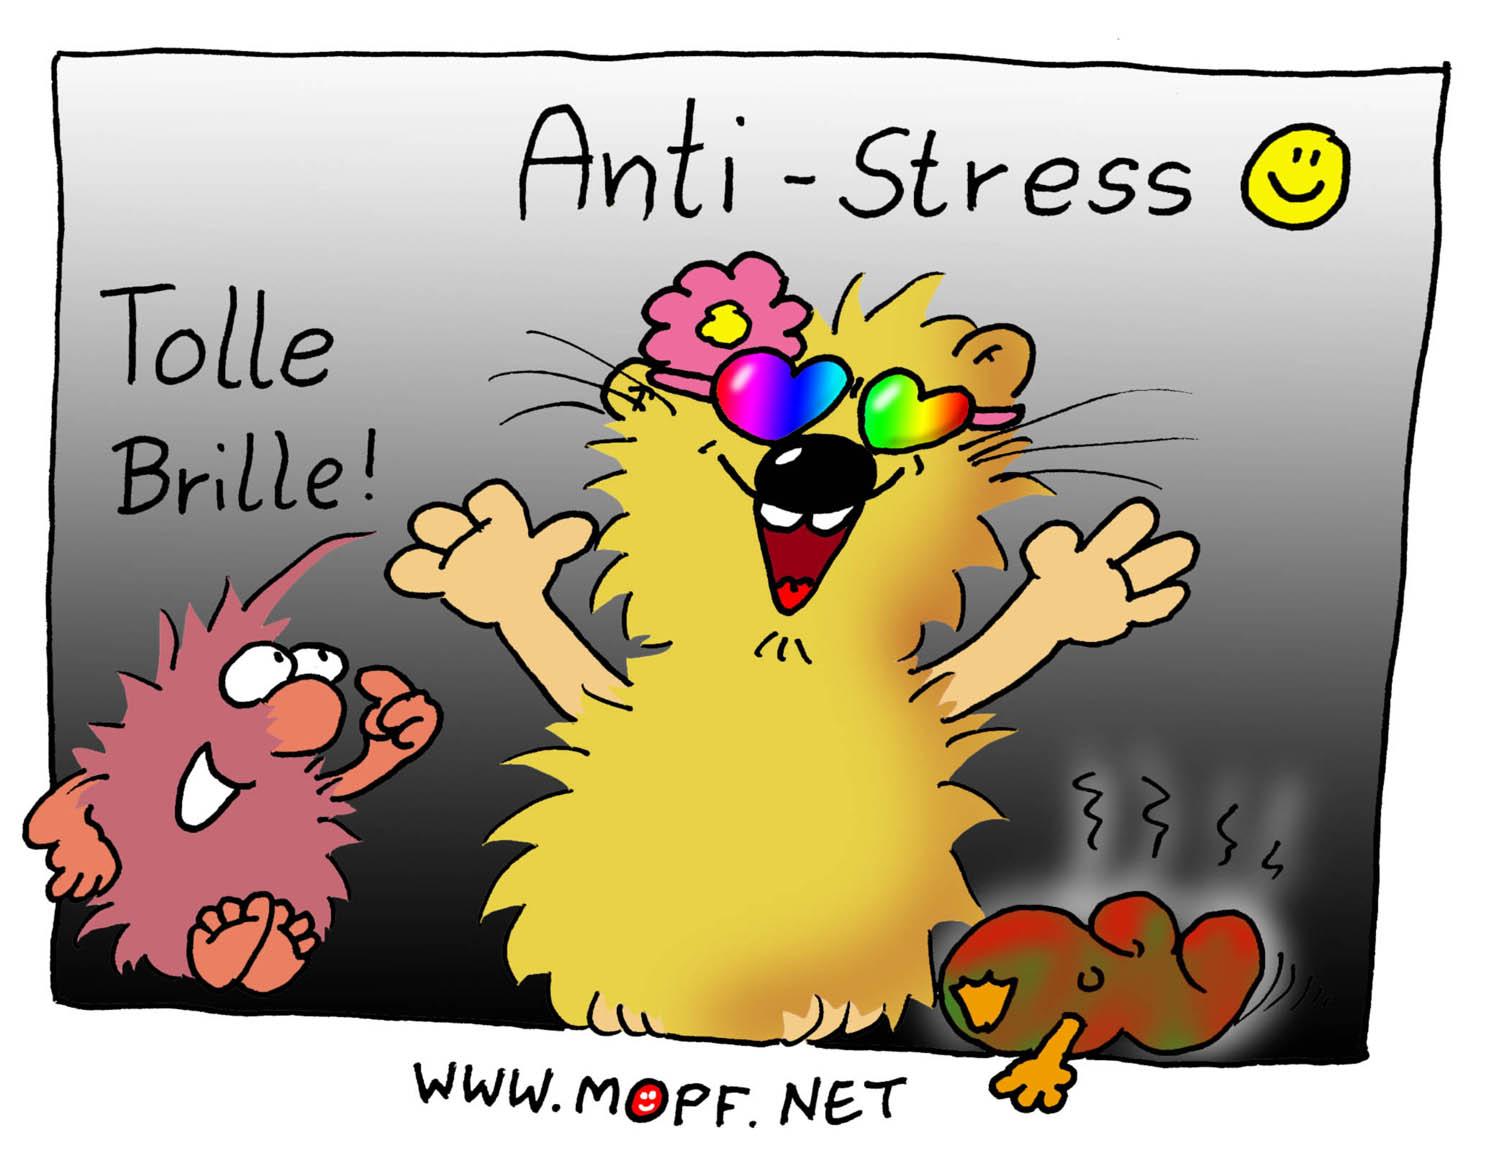 Anti-Stress-Mopf-.jpg